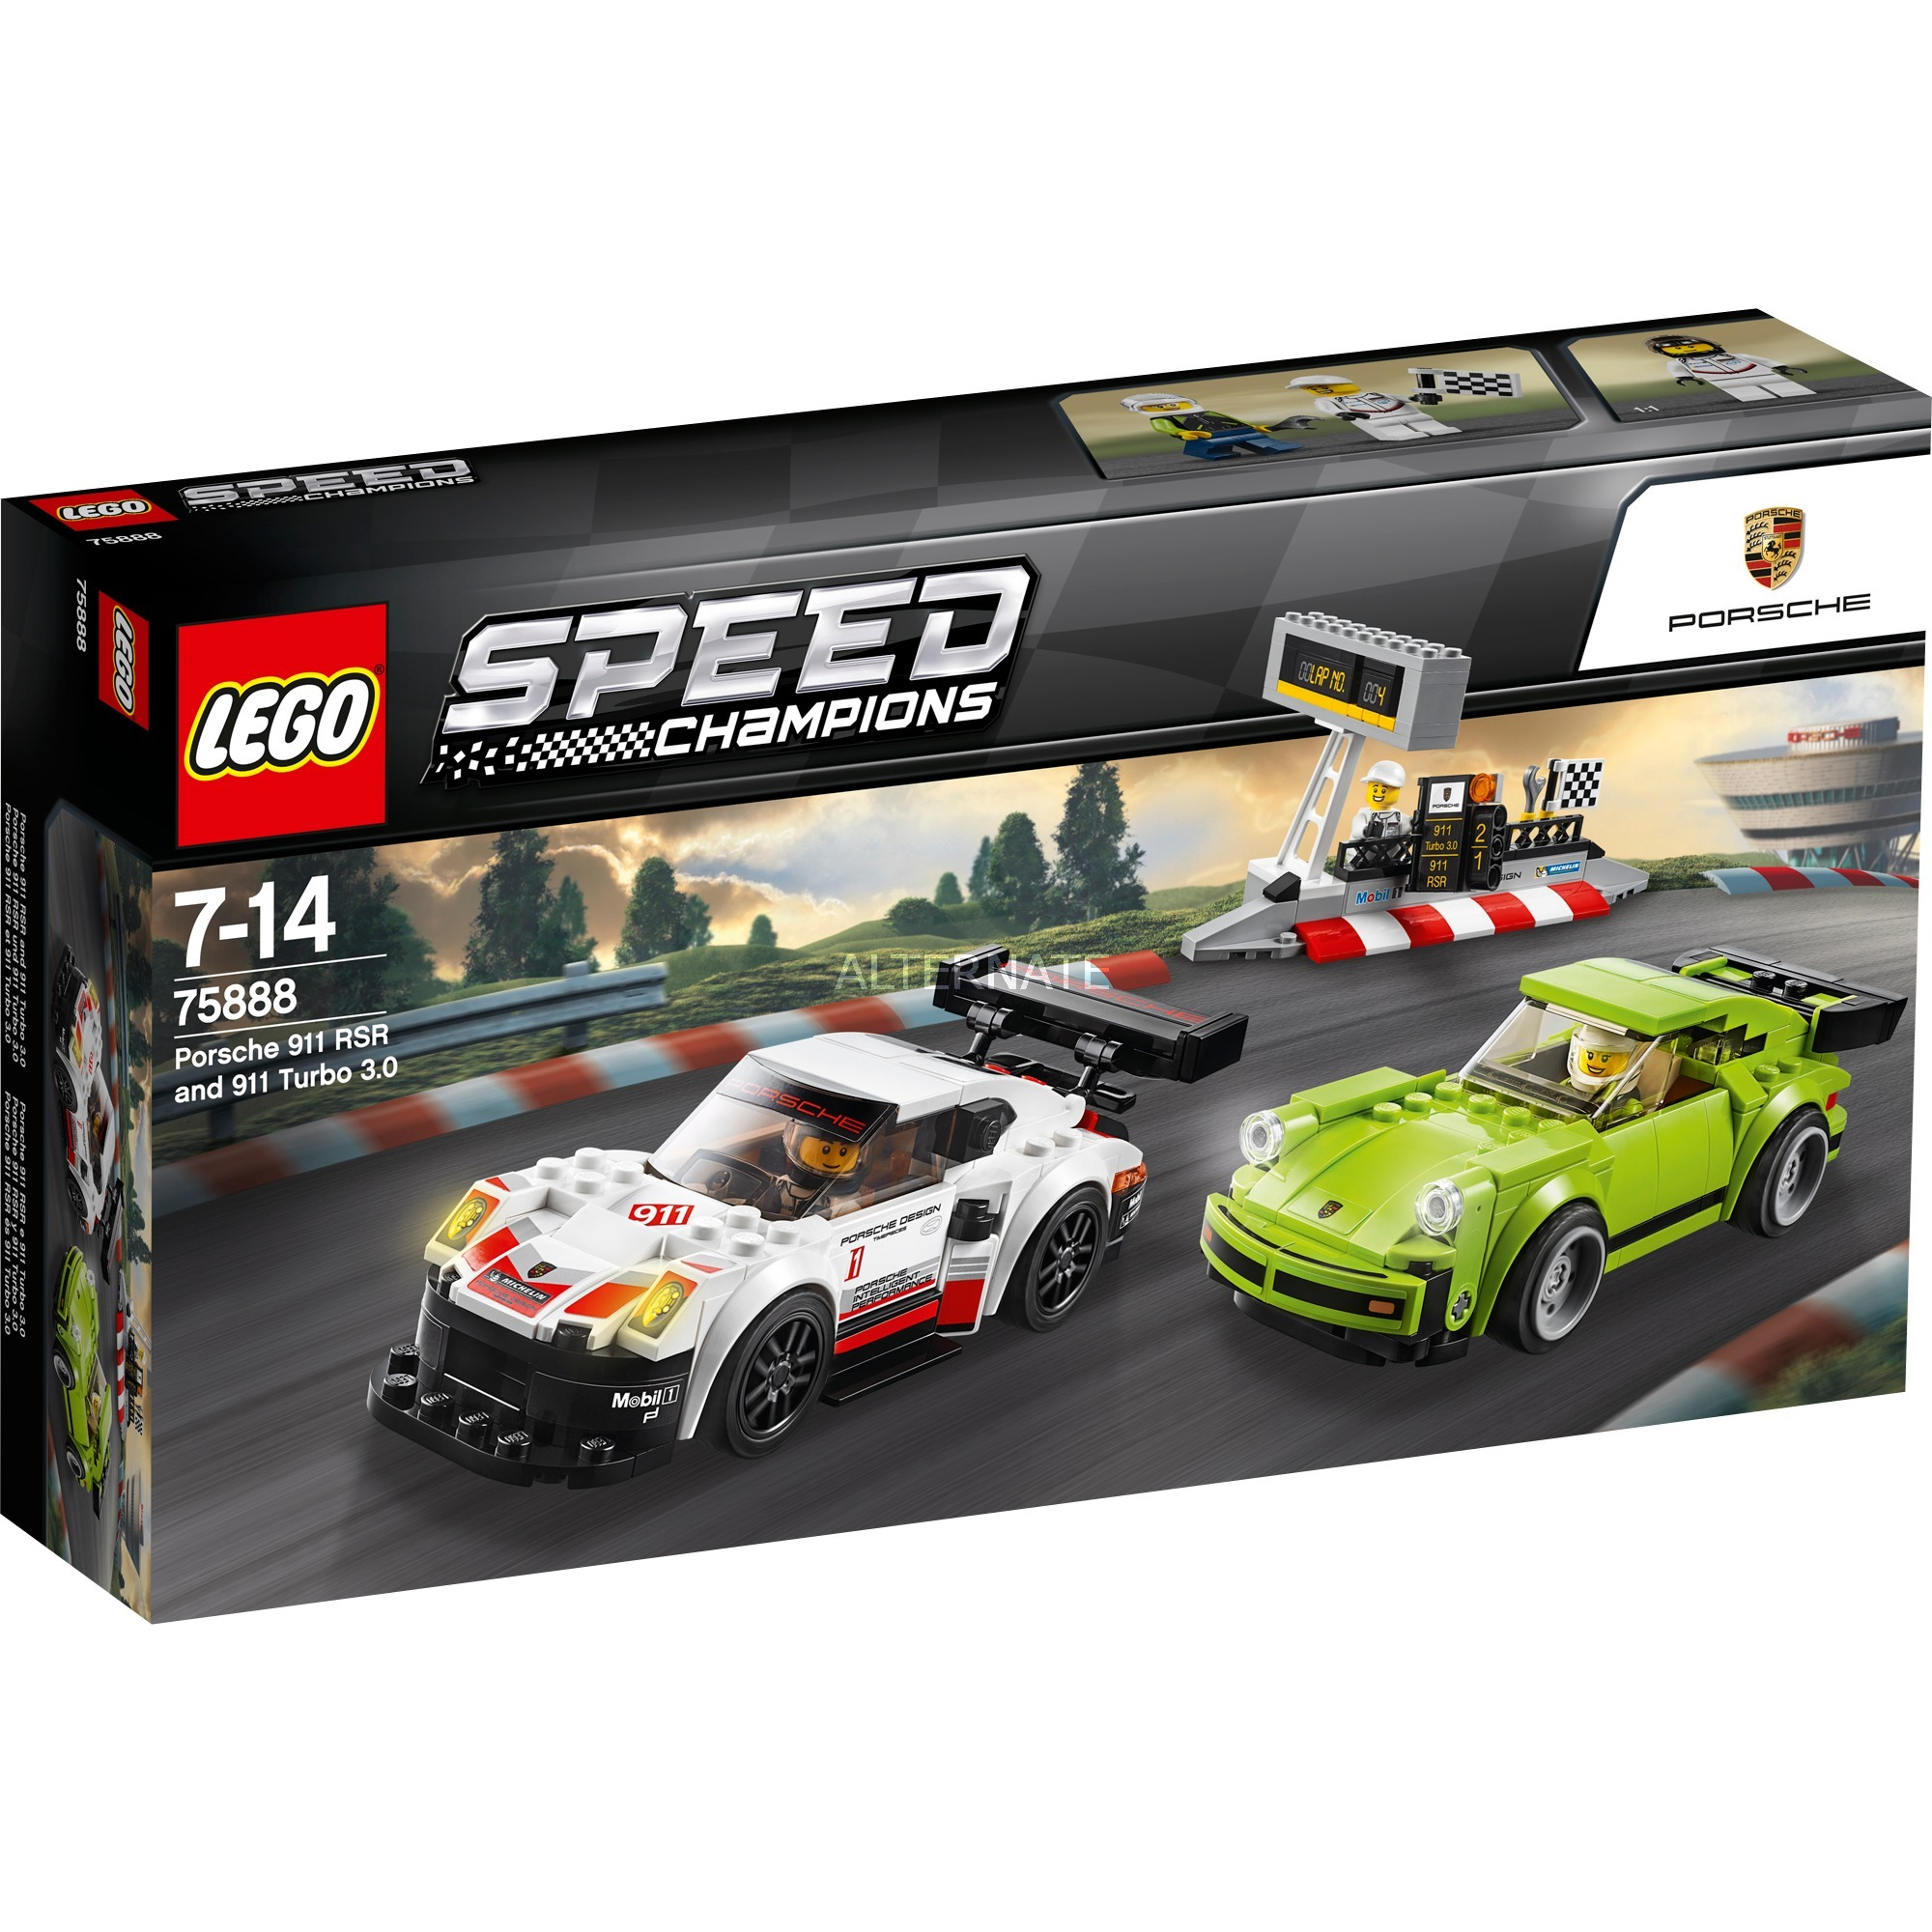 LEGO Speed Champions - Porsche 911 RSR y 911 Turbo 3.0 - 75888